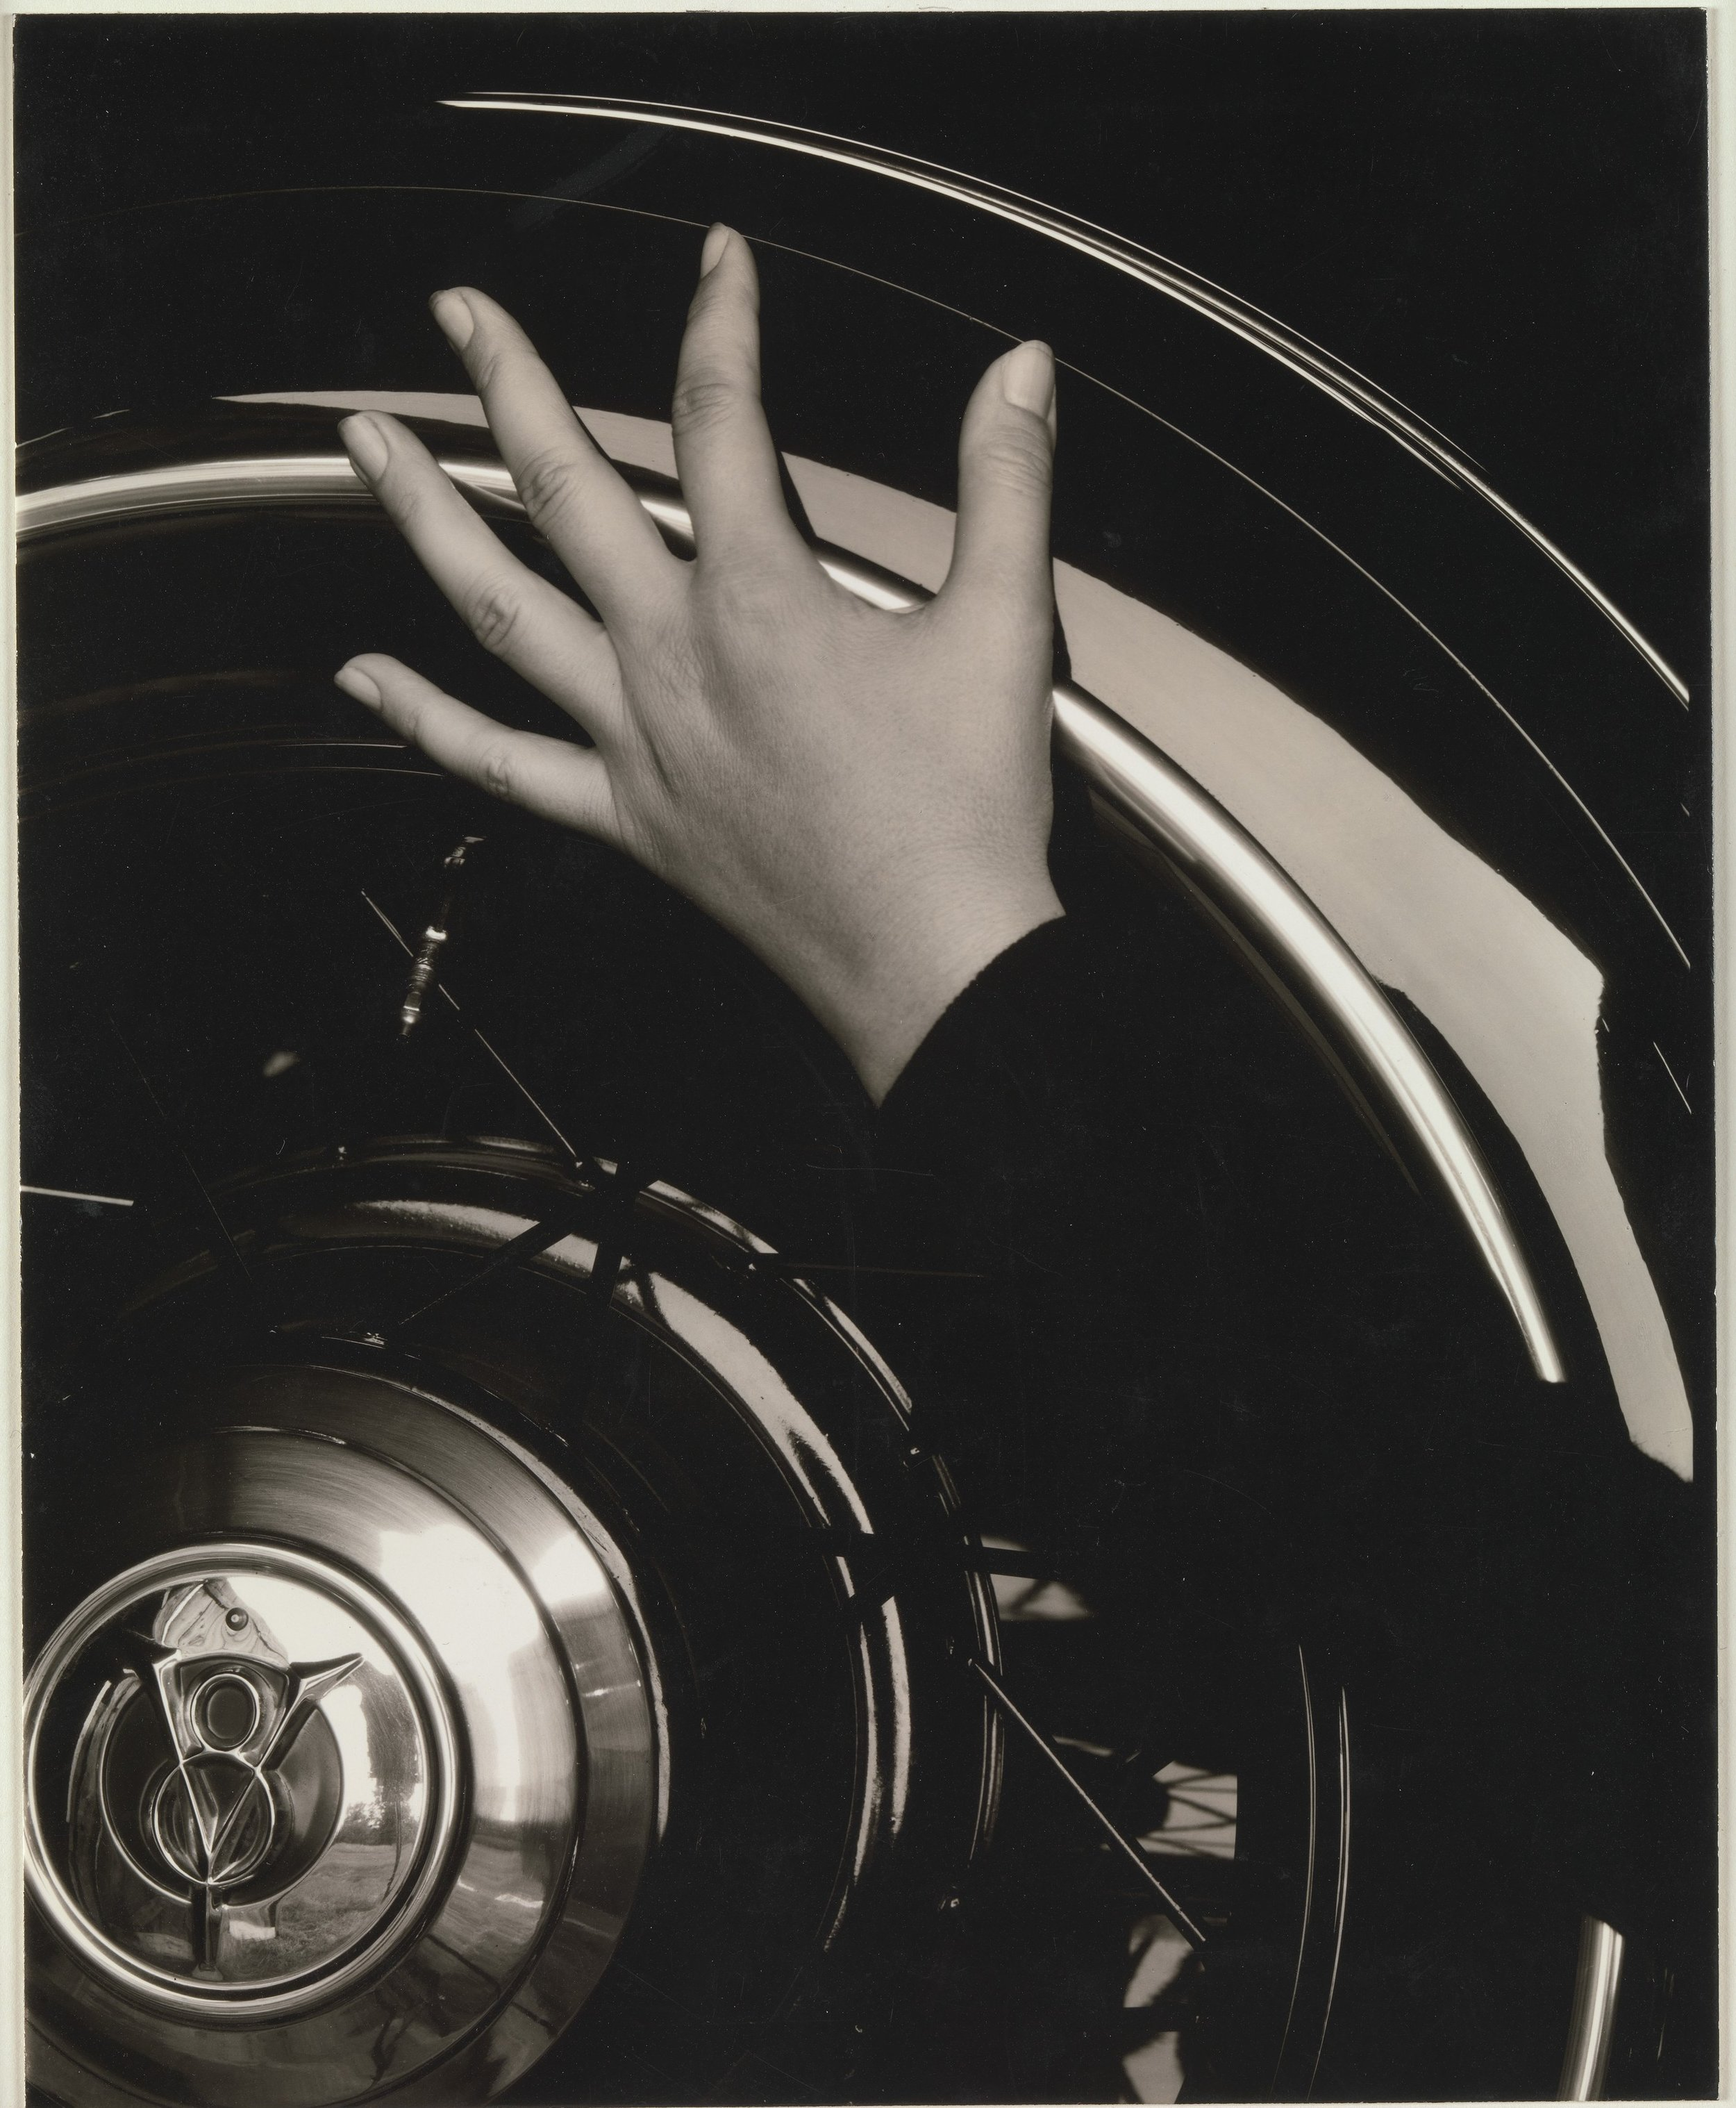 Alfred Stieglitz. Georgia O'Keeffe—Hand and Wheel. 1933. Courtesy of the Metropolitan Museum